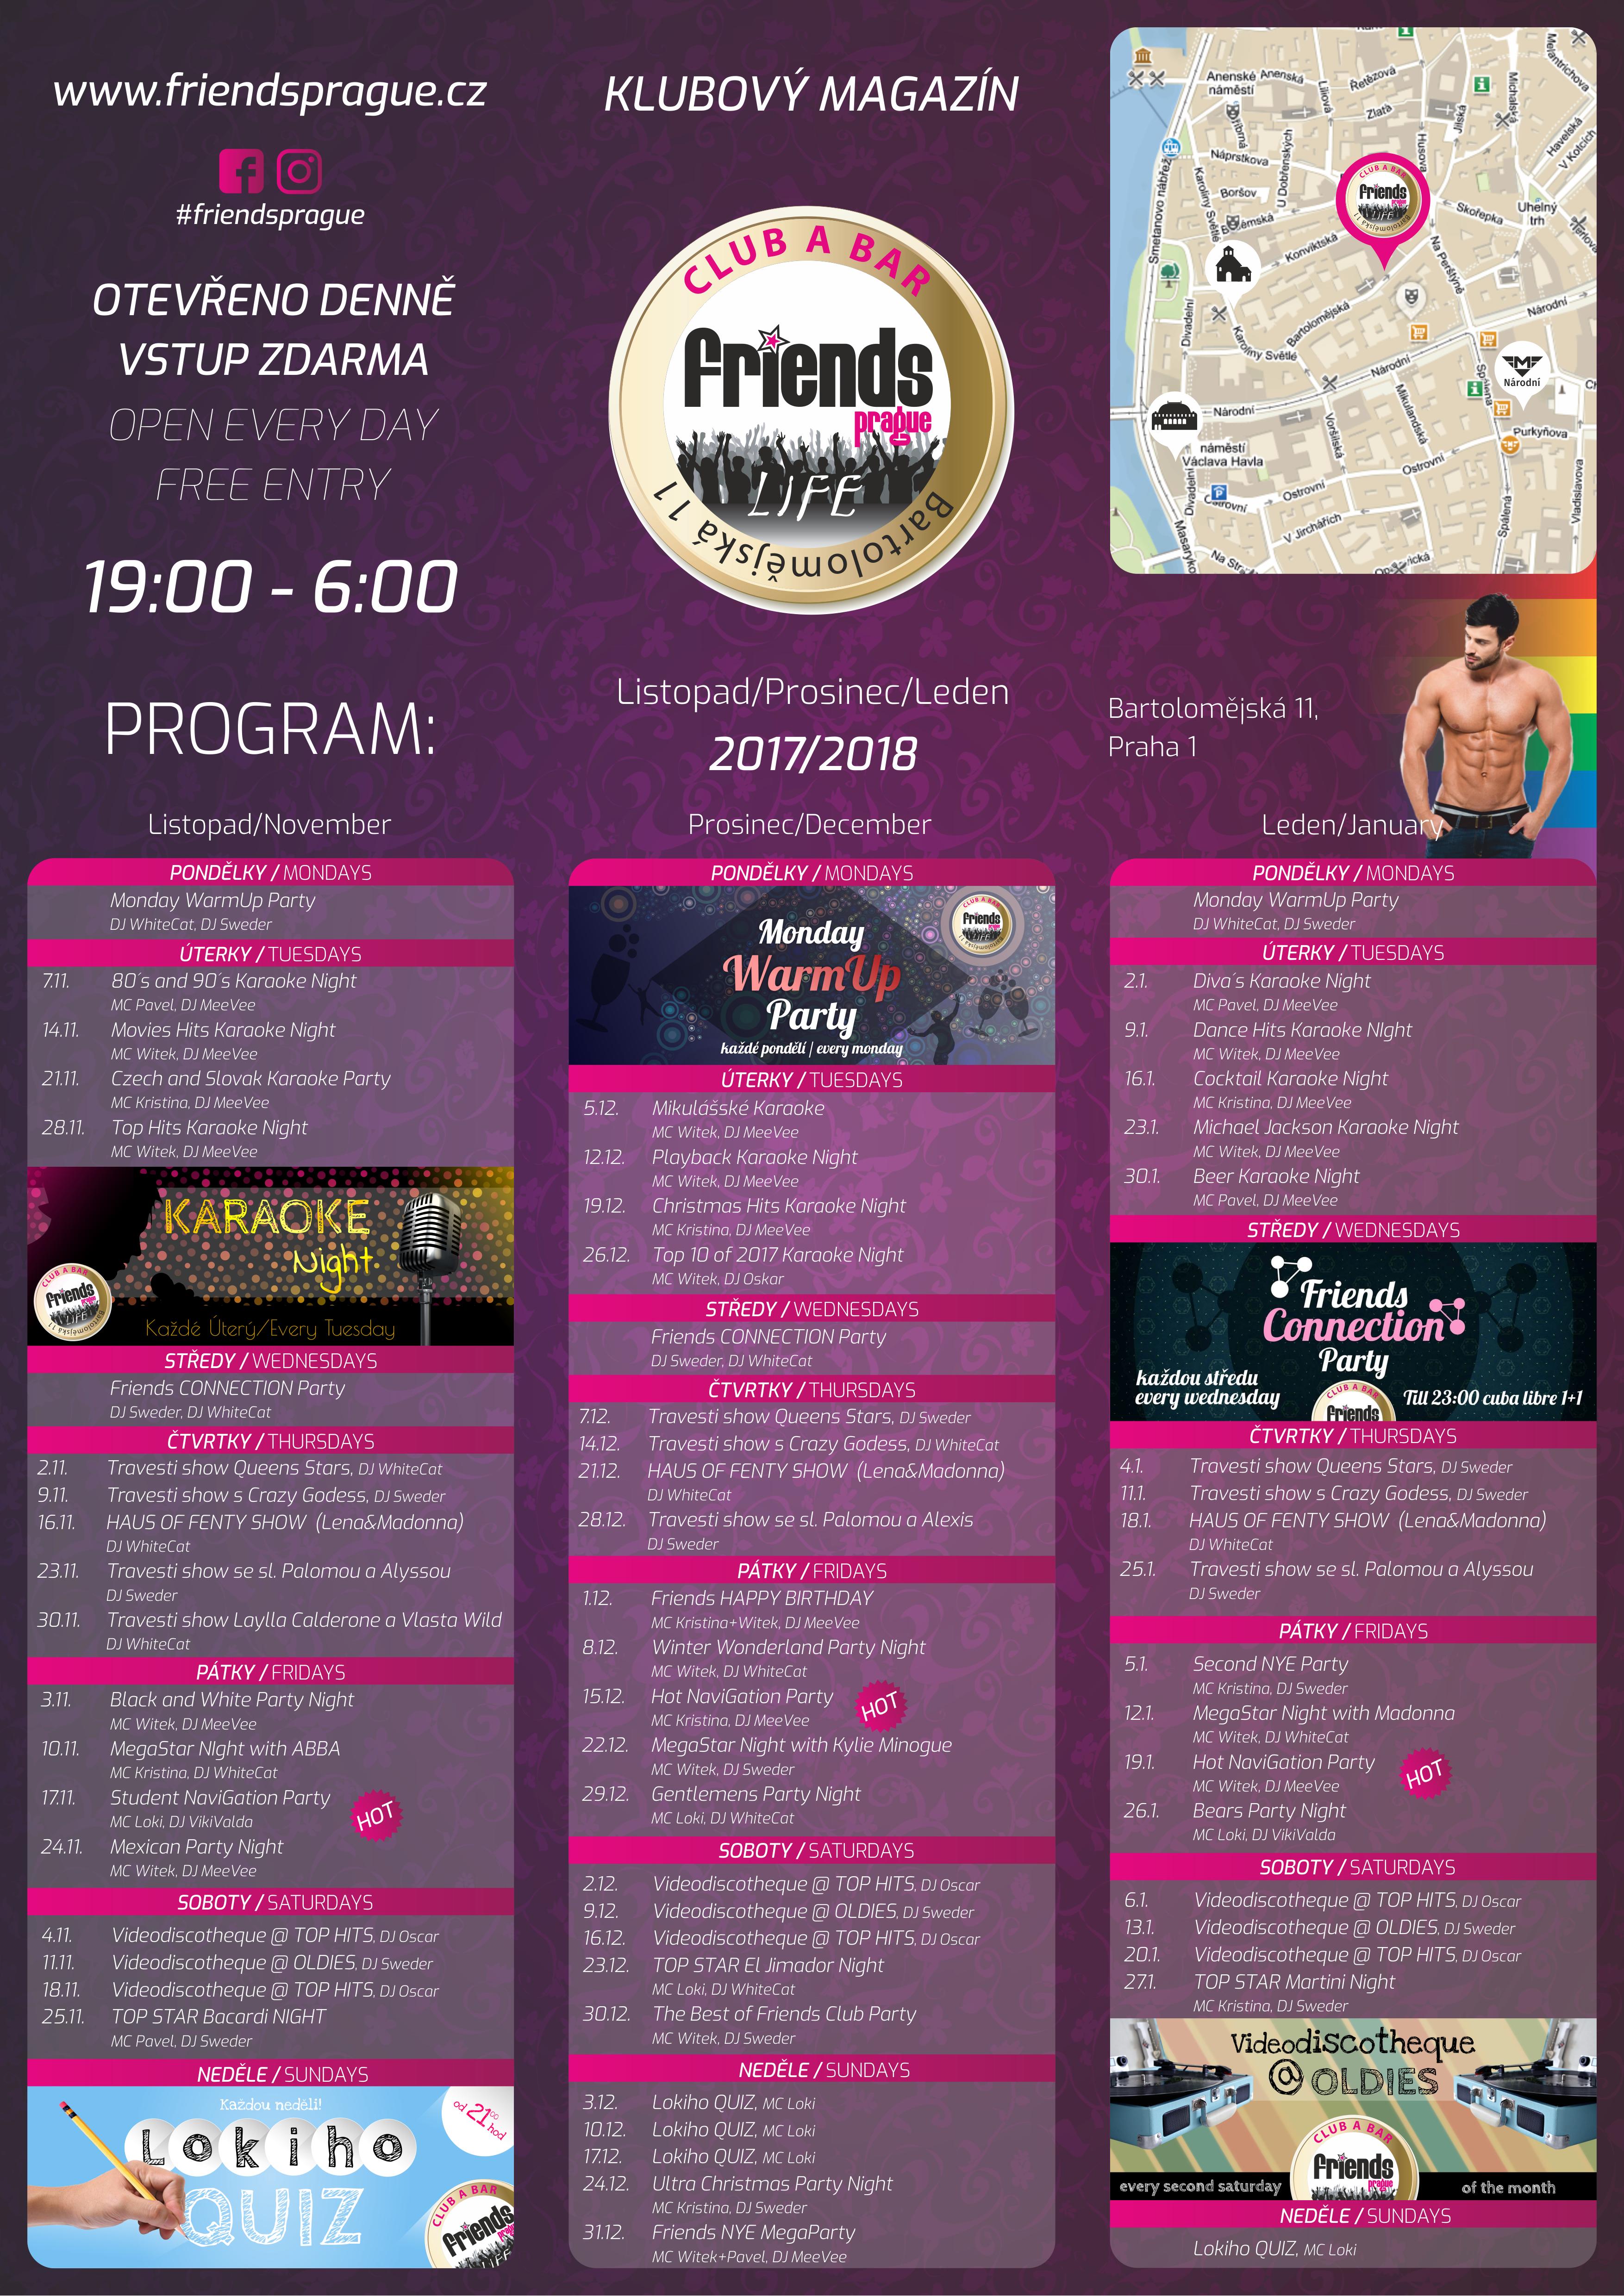 klubovy-magazin-listopad_prosinec_leden